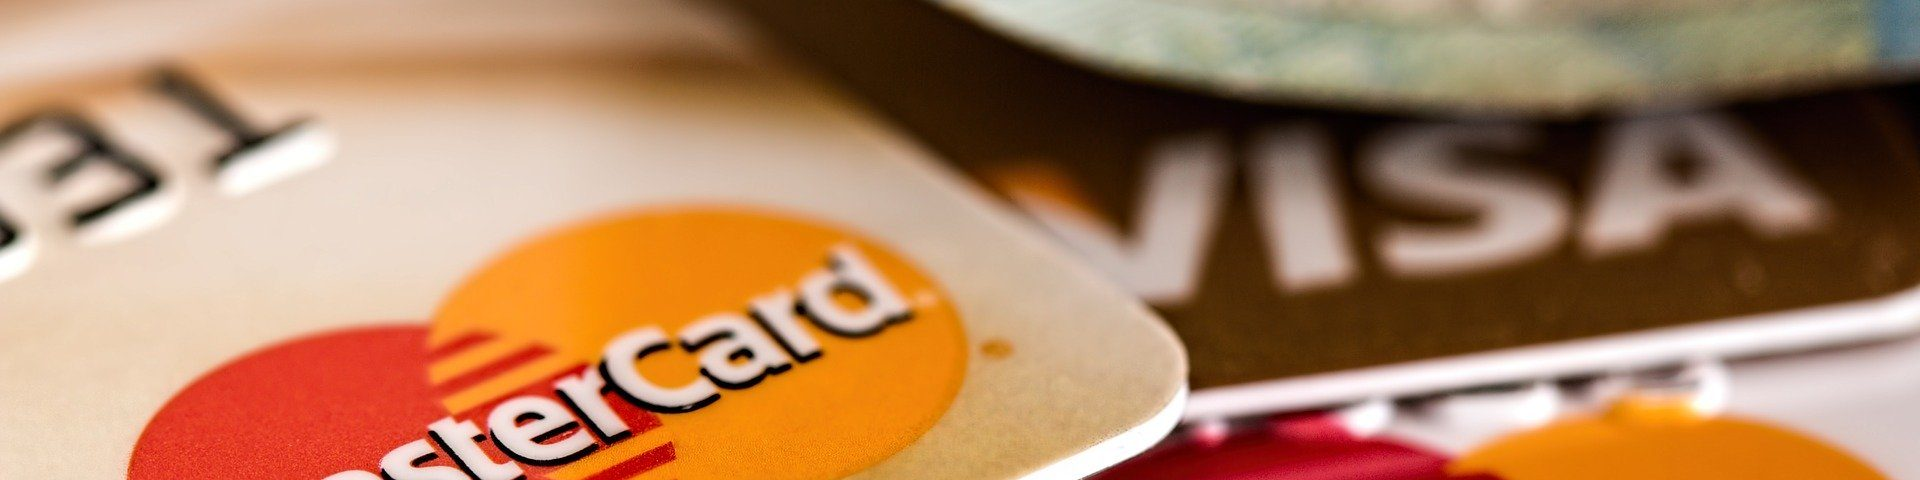 Credit Card 851506 1920